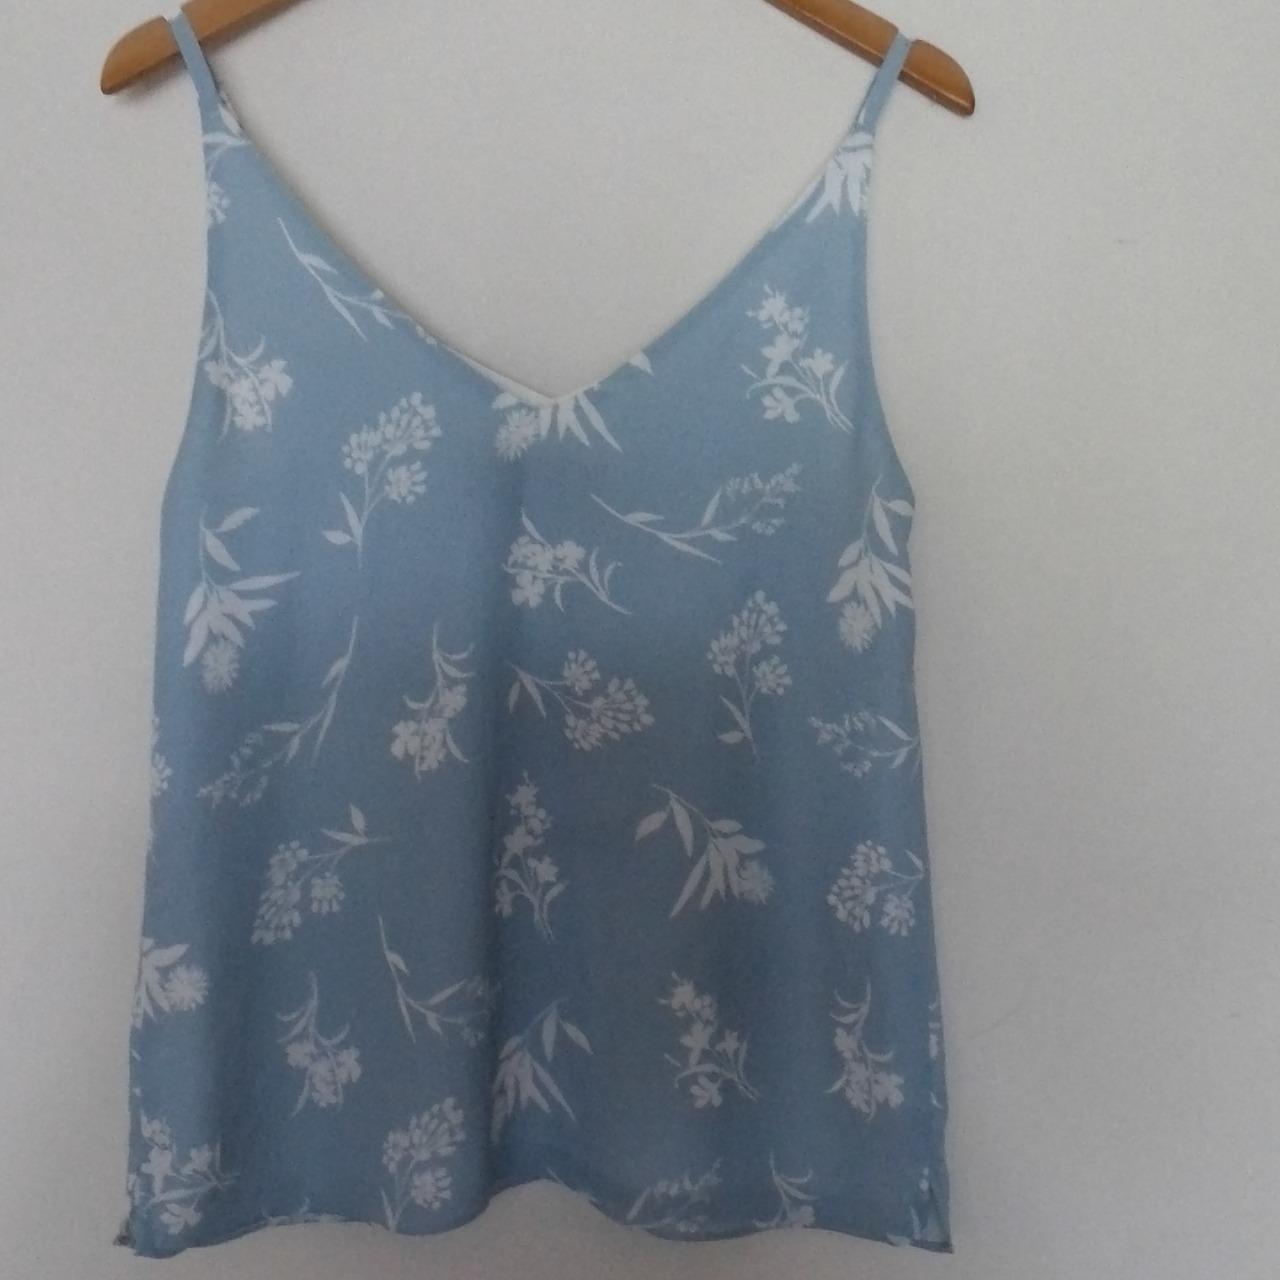 BNWT DECJUBA Womens  Size 8 Floral Tops/Cami  White/Blue